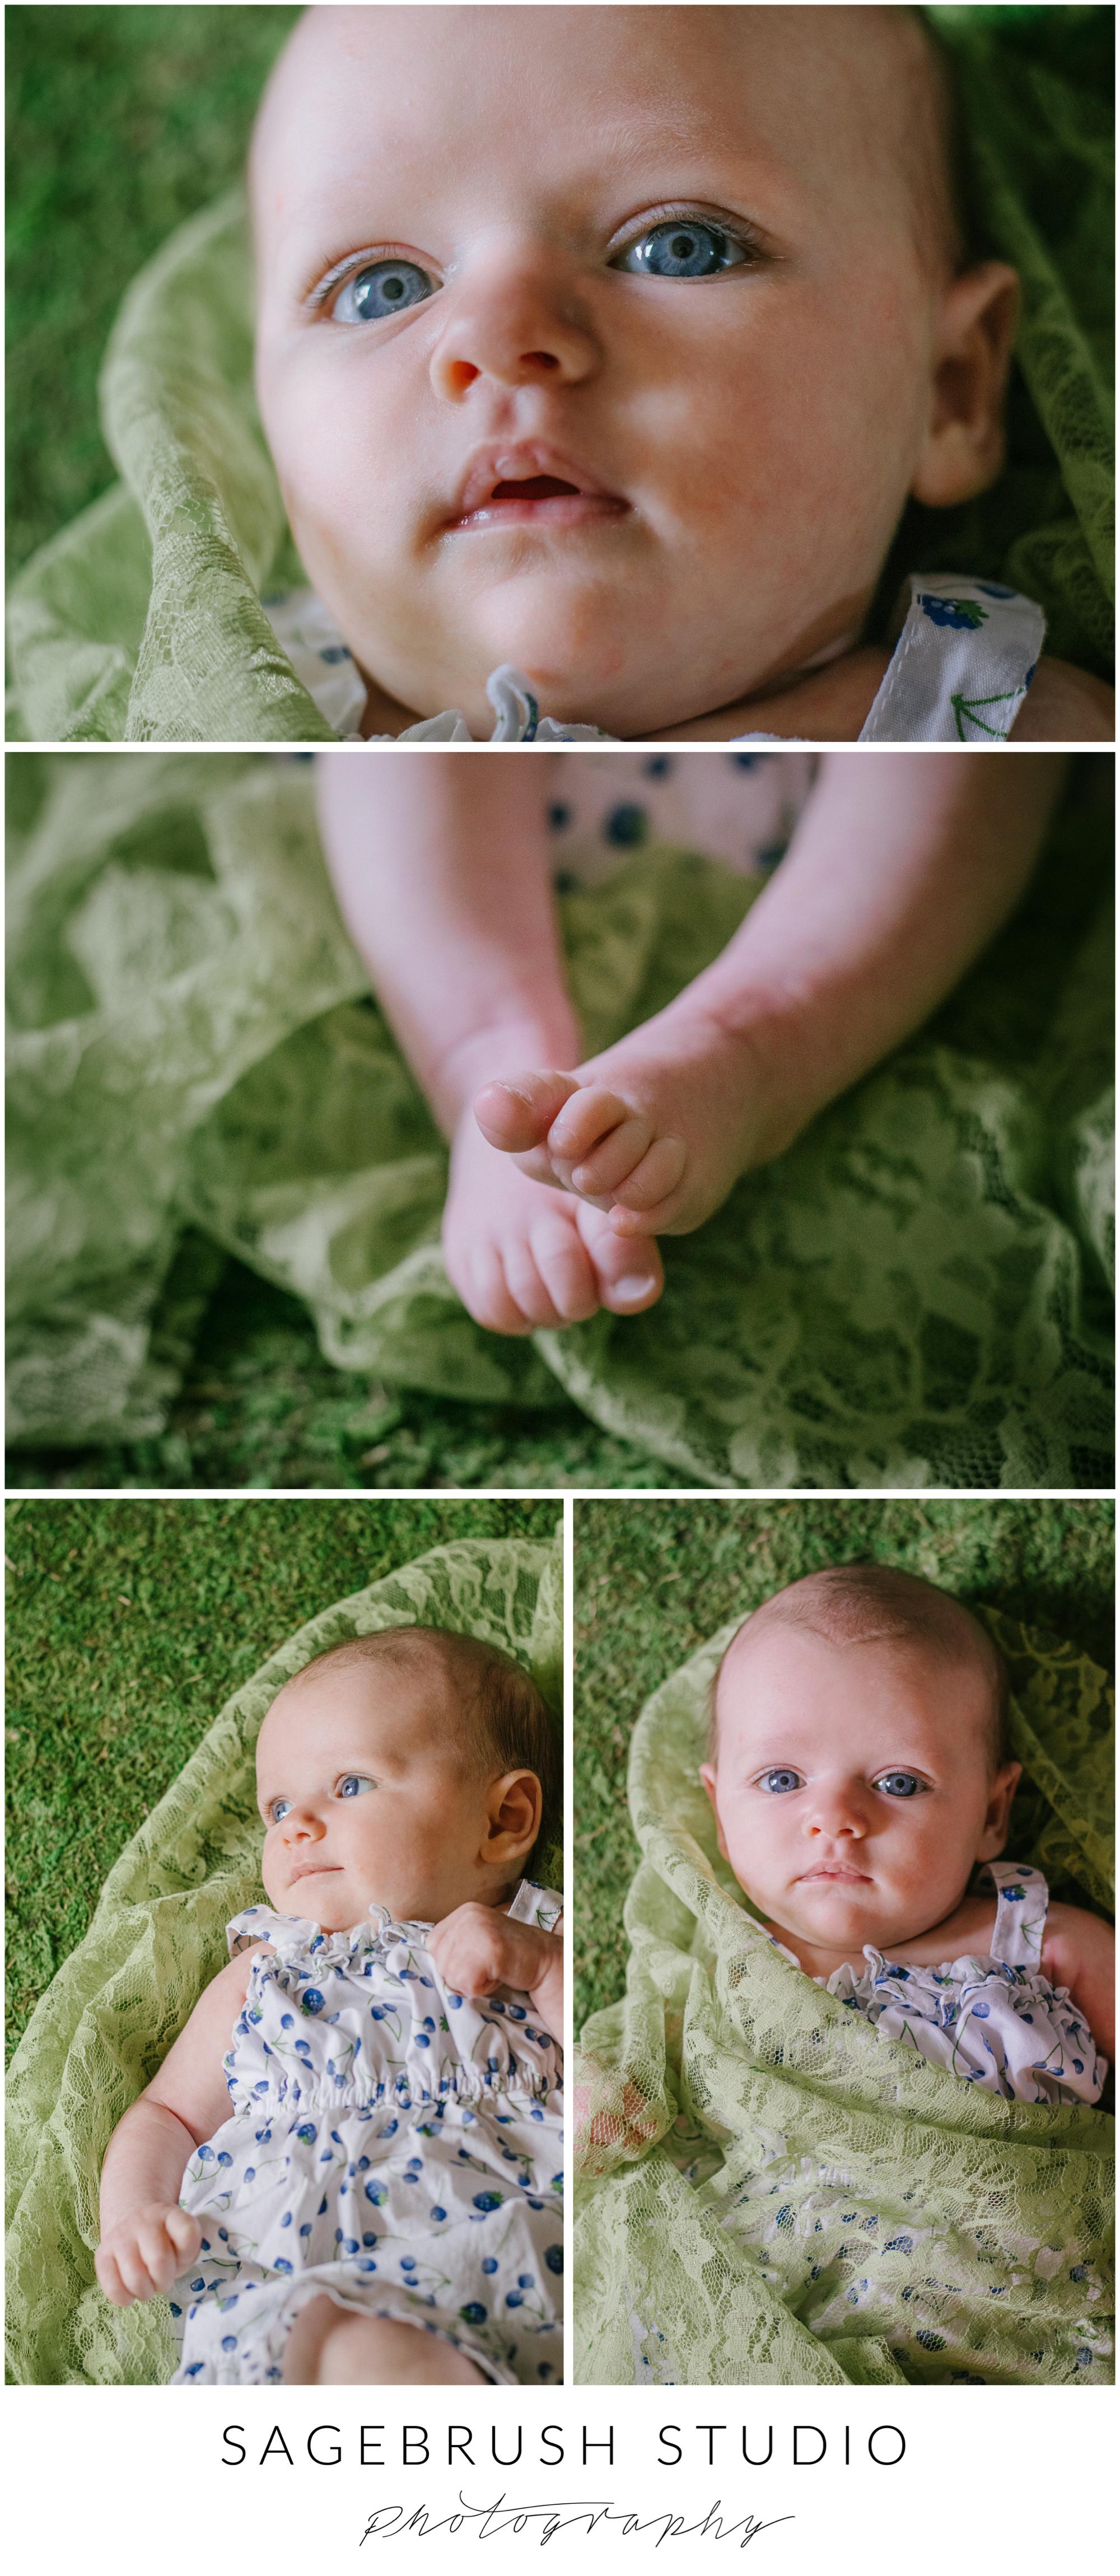 Baby Photography, Baby Blue Eyes. Sagebrush Studio Photography. Shelby, Montana